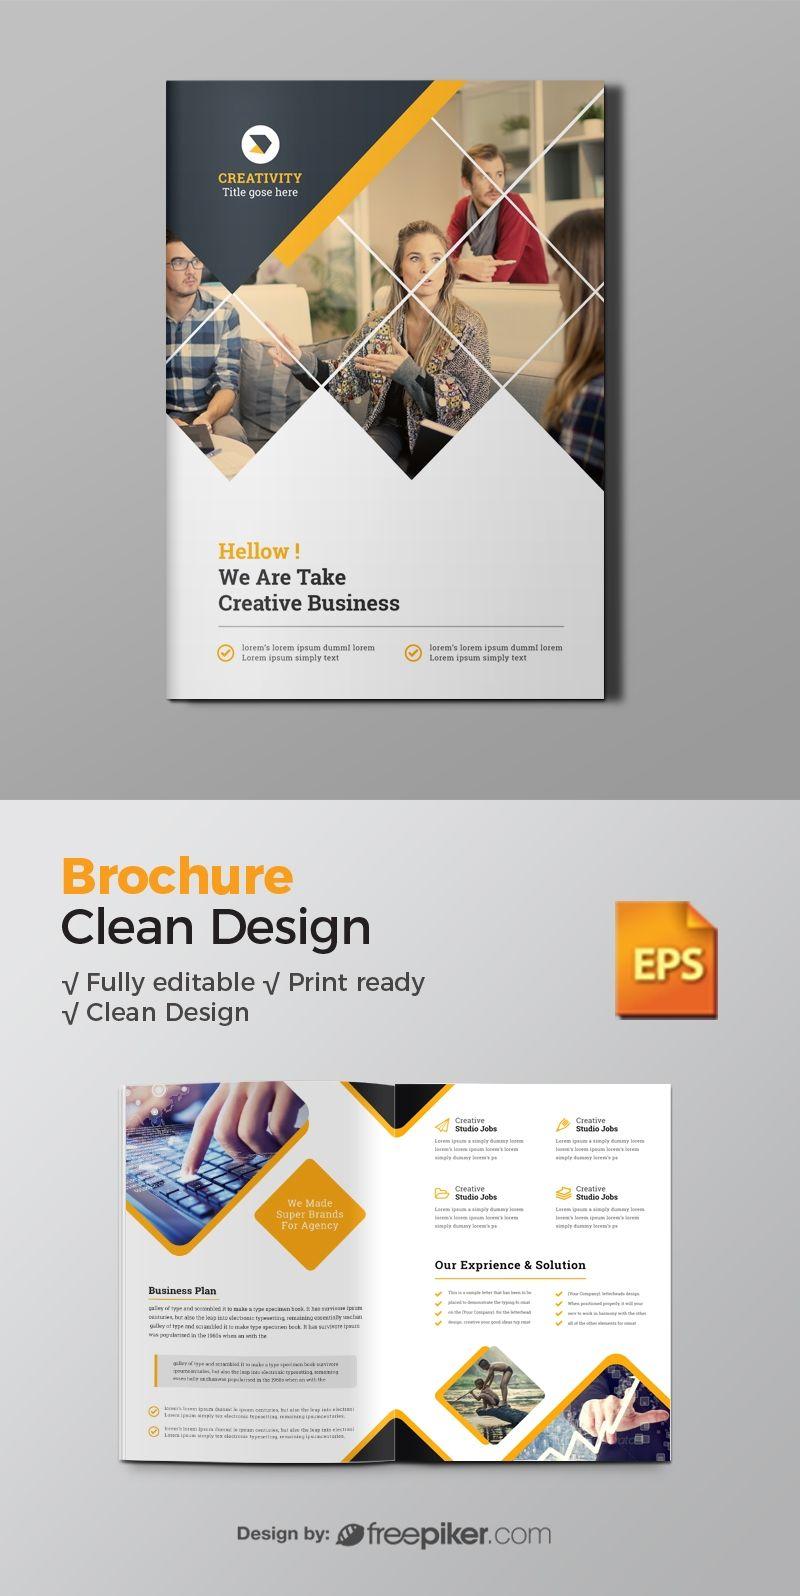 Freepiker | business bi-fold brochure with green concepts